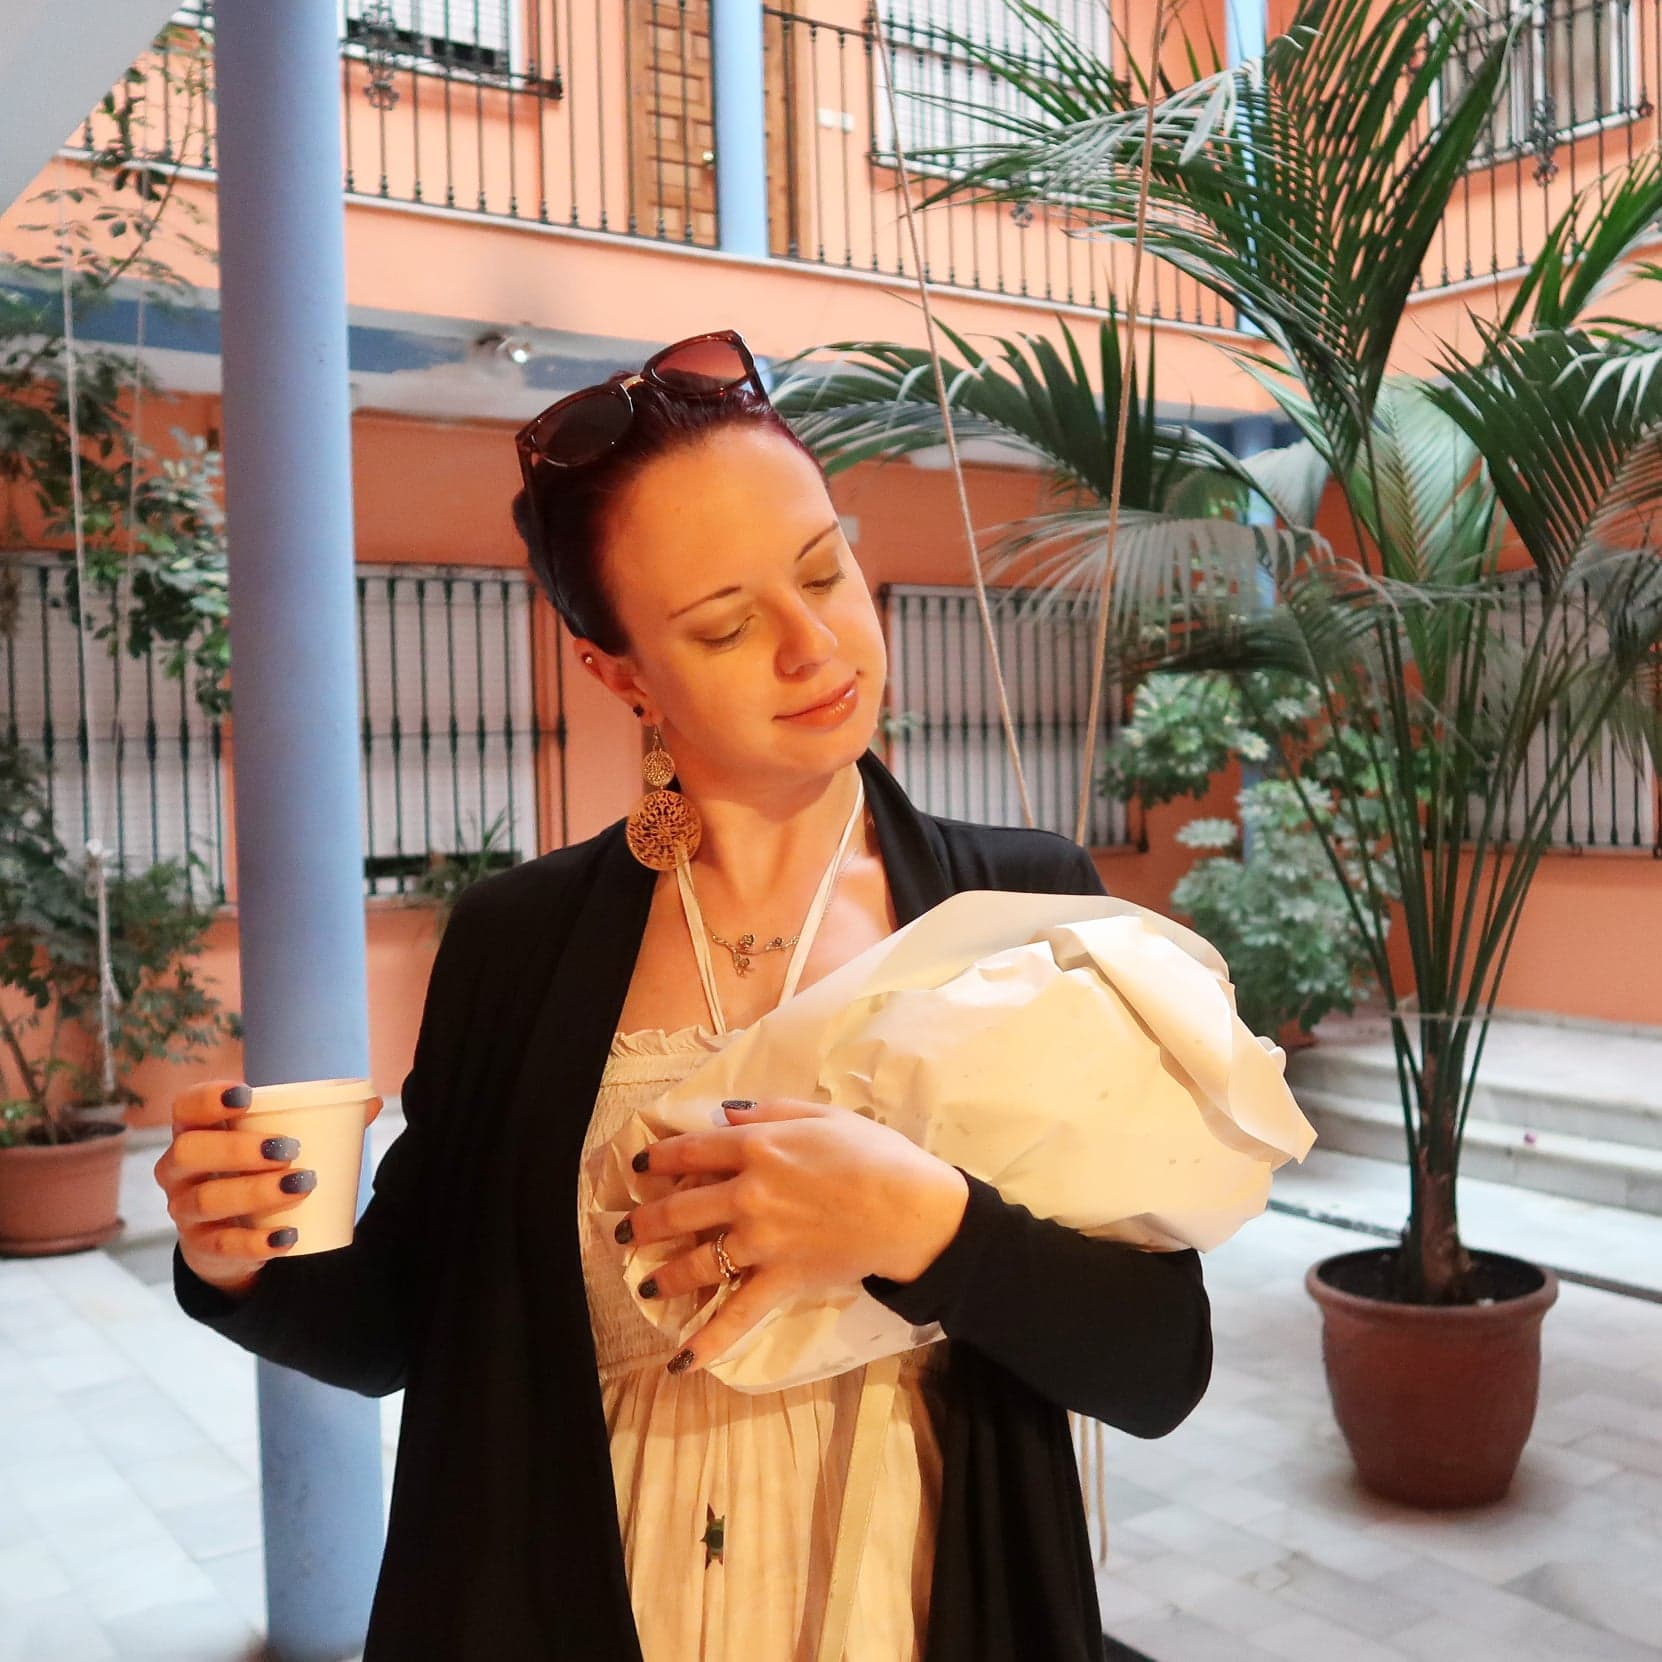 me holding churros